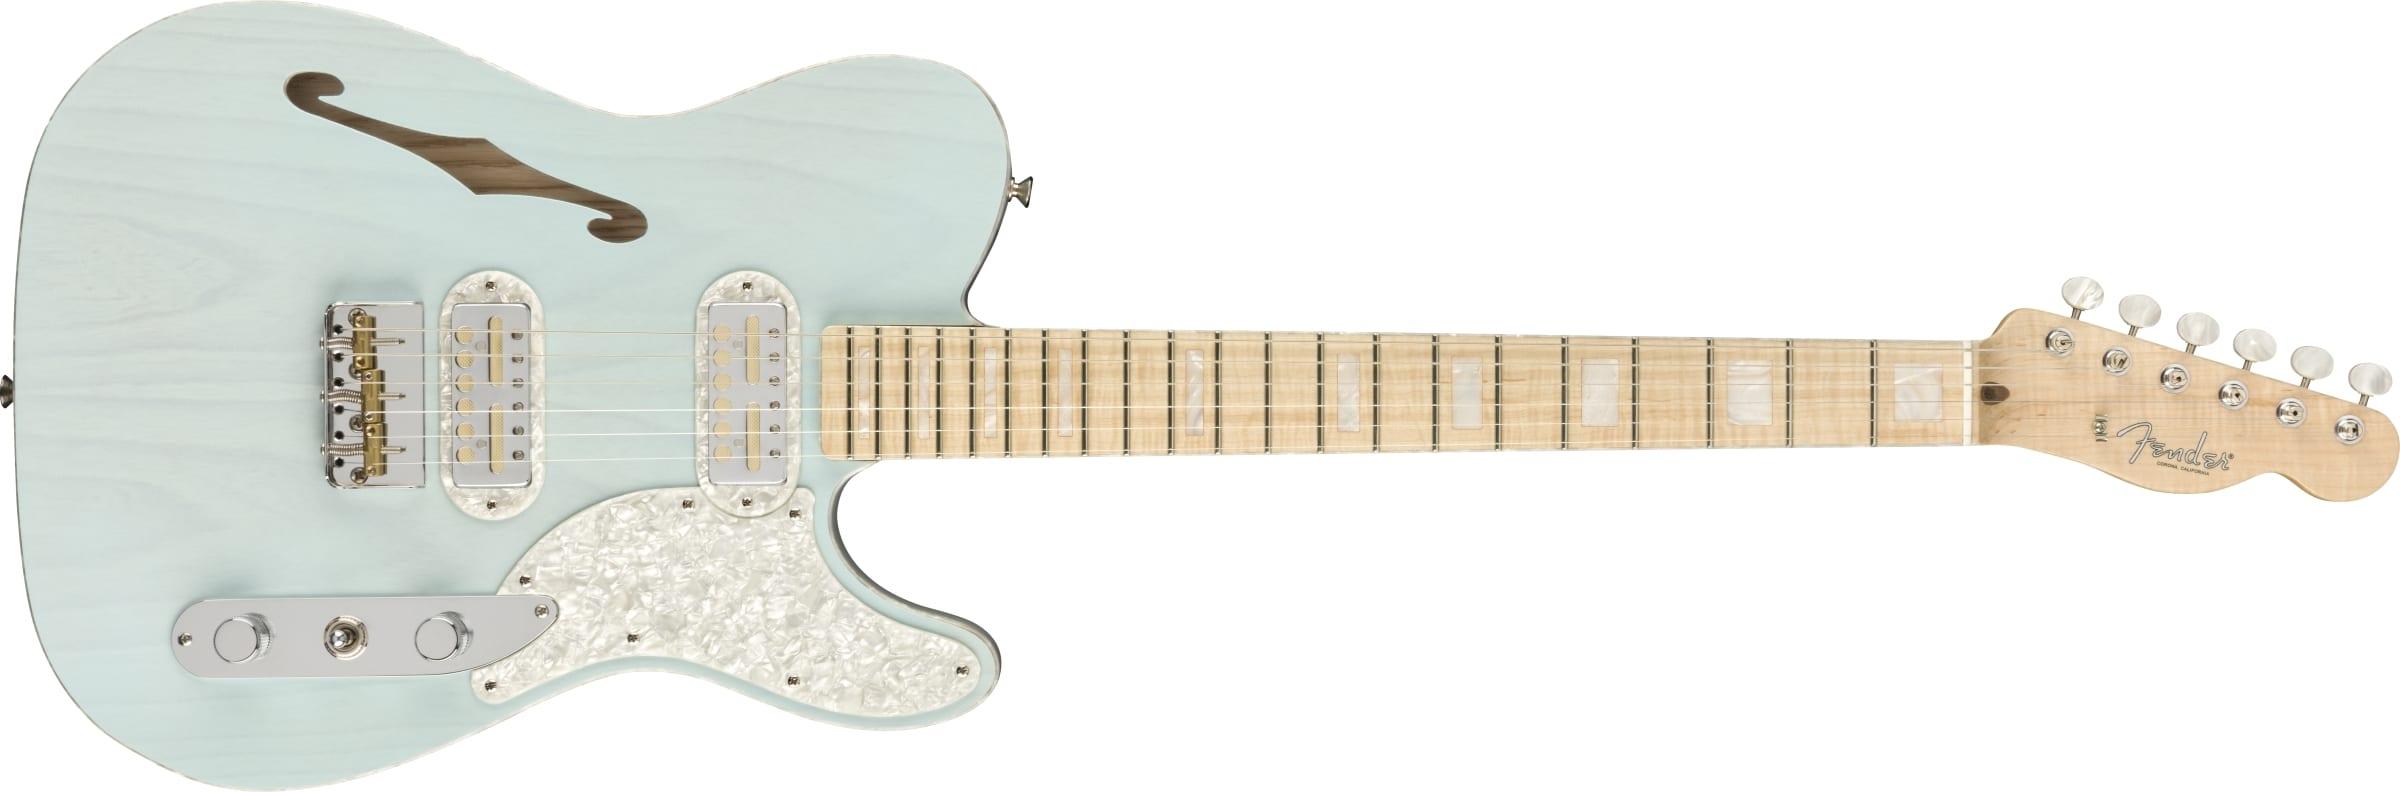 Fender Parallel Universe Volume II Tele Mágico Trans Daphne Blue